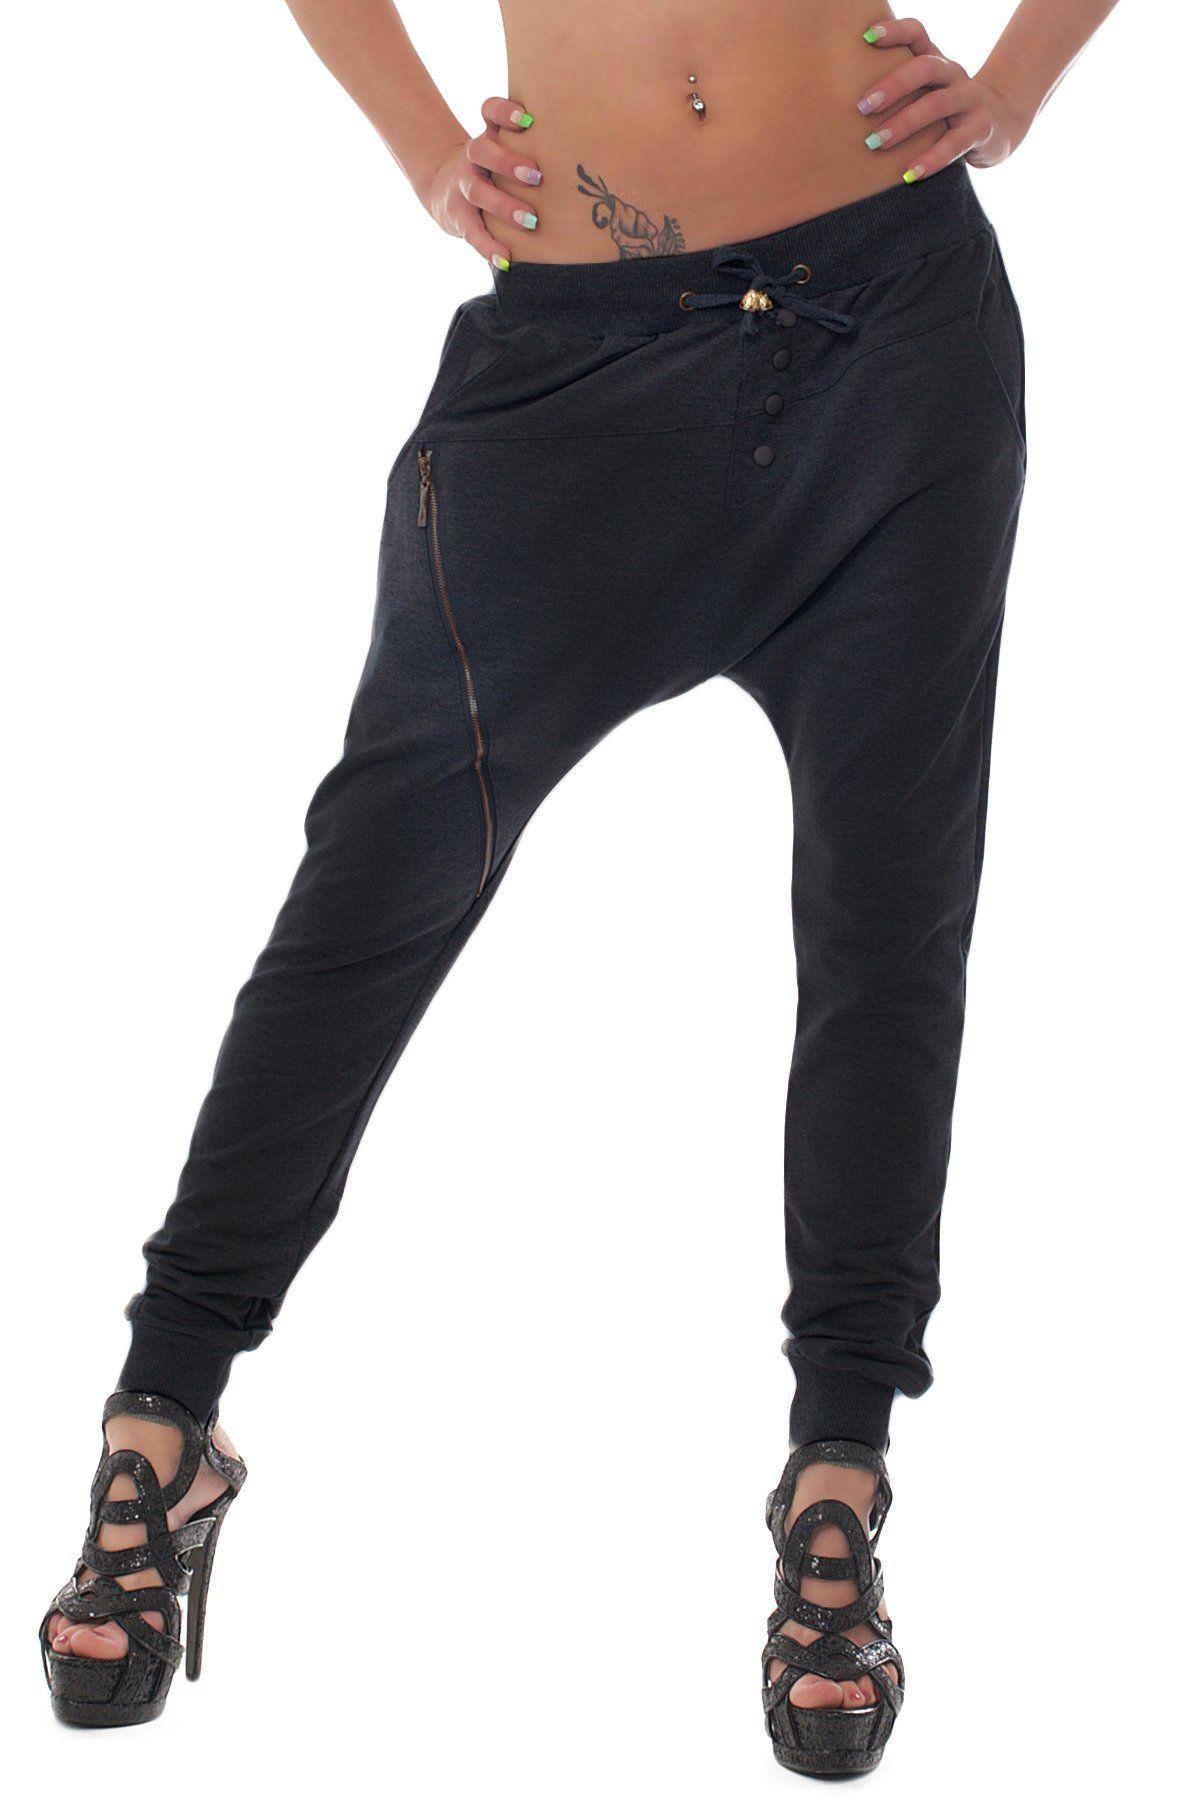 Fashion4Young Damen Haremshose Hose pants aus Sweat-Material verfügbar in 5 Größen 2 Farben (S = 36, Schwarz1)